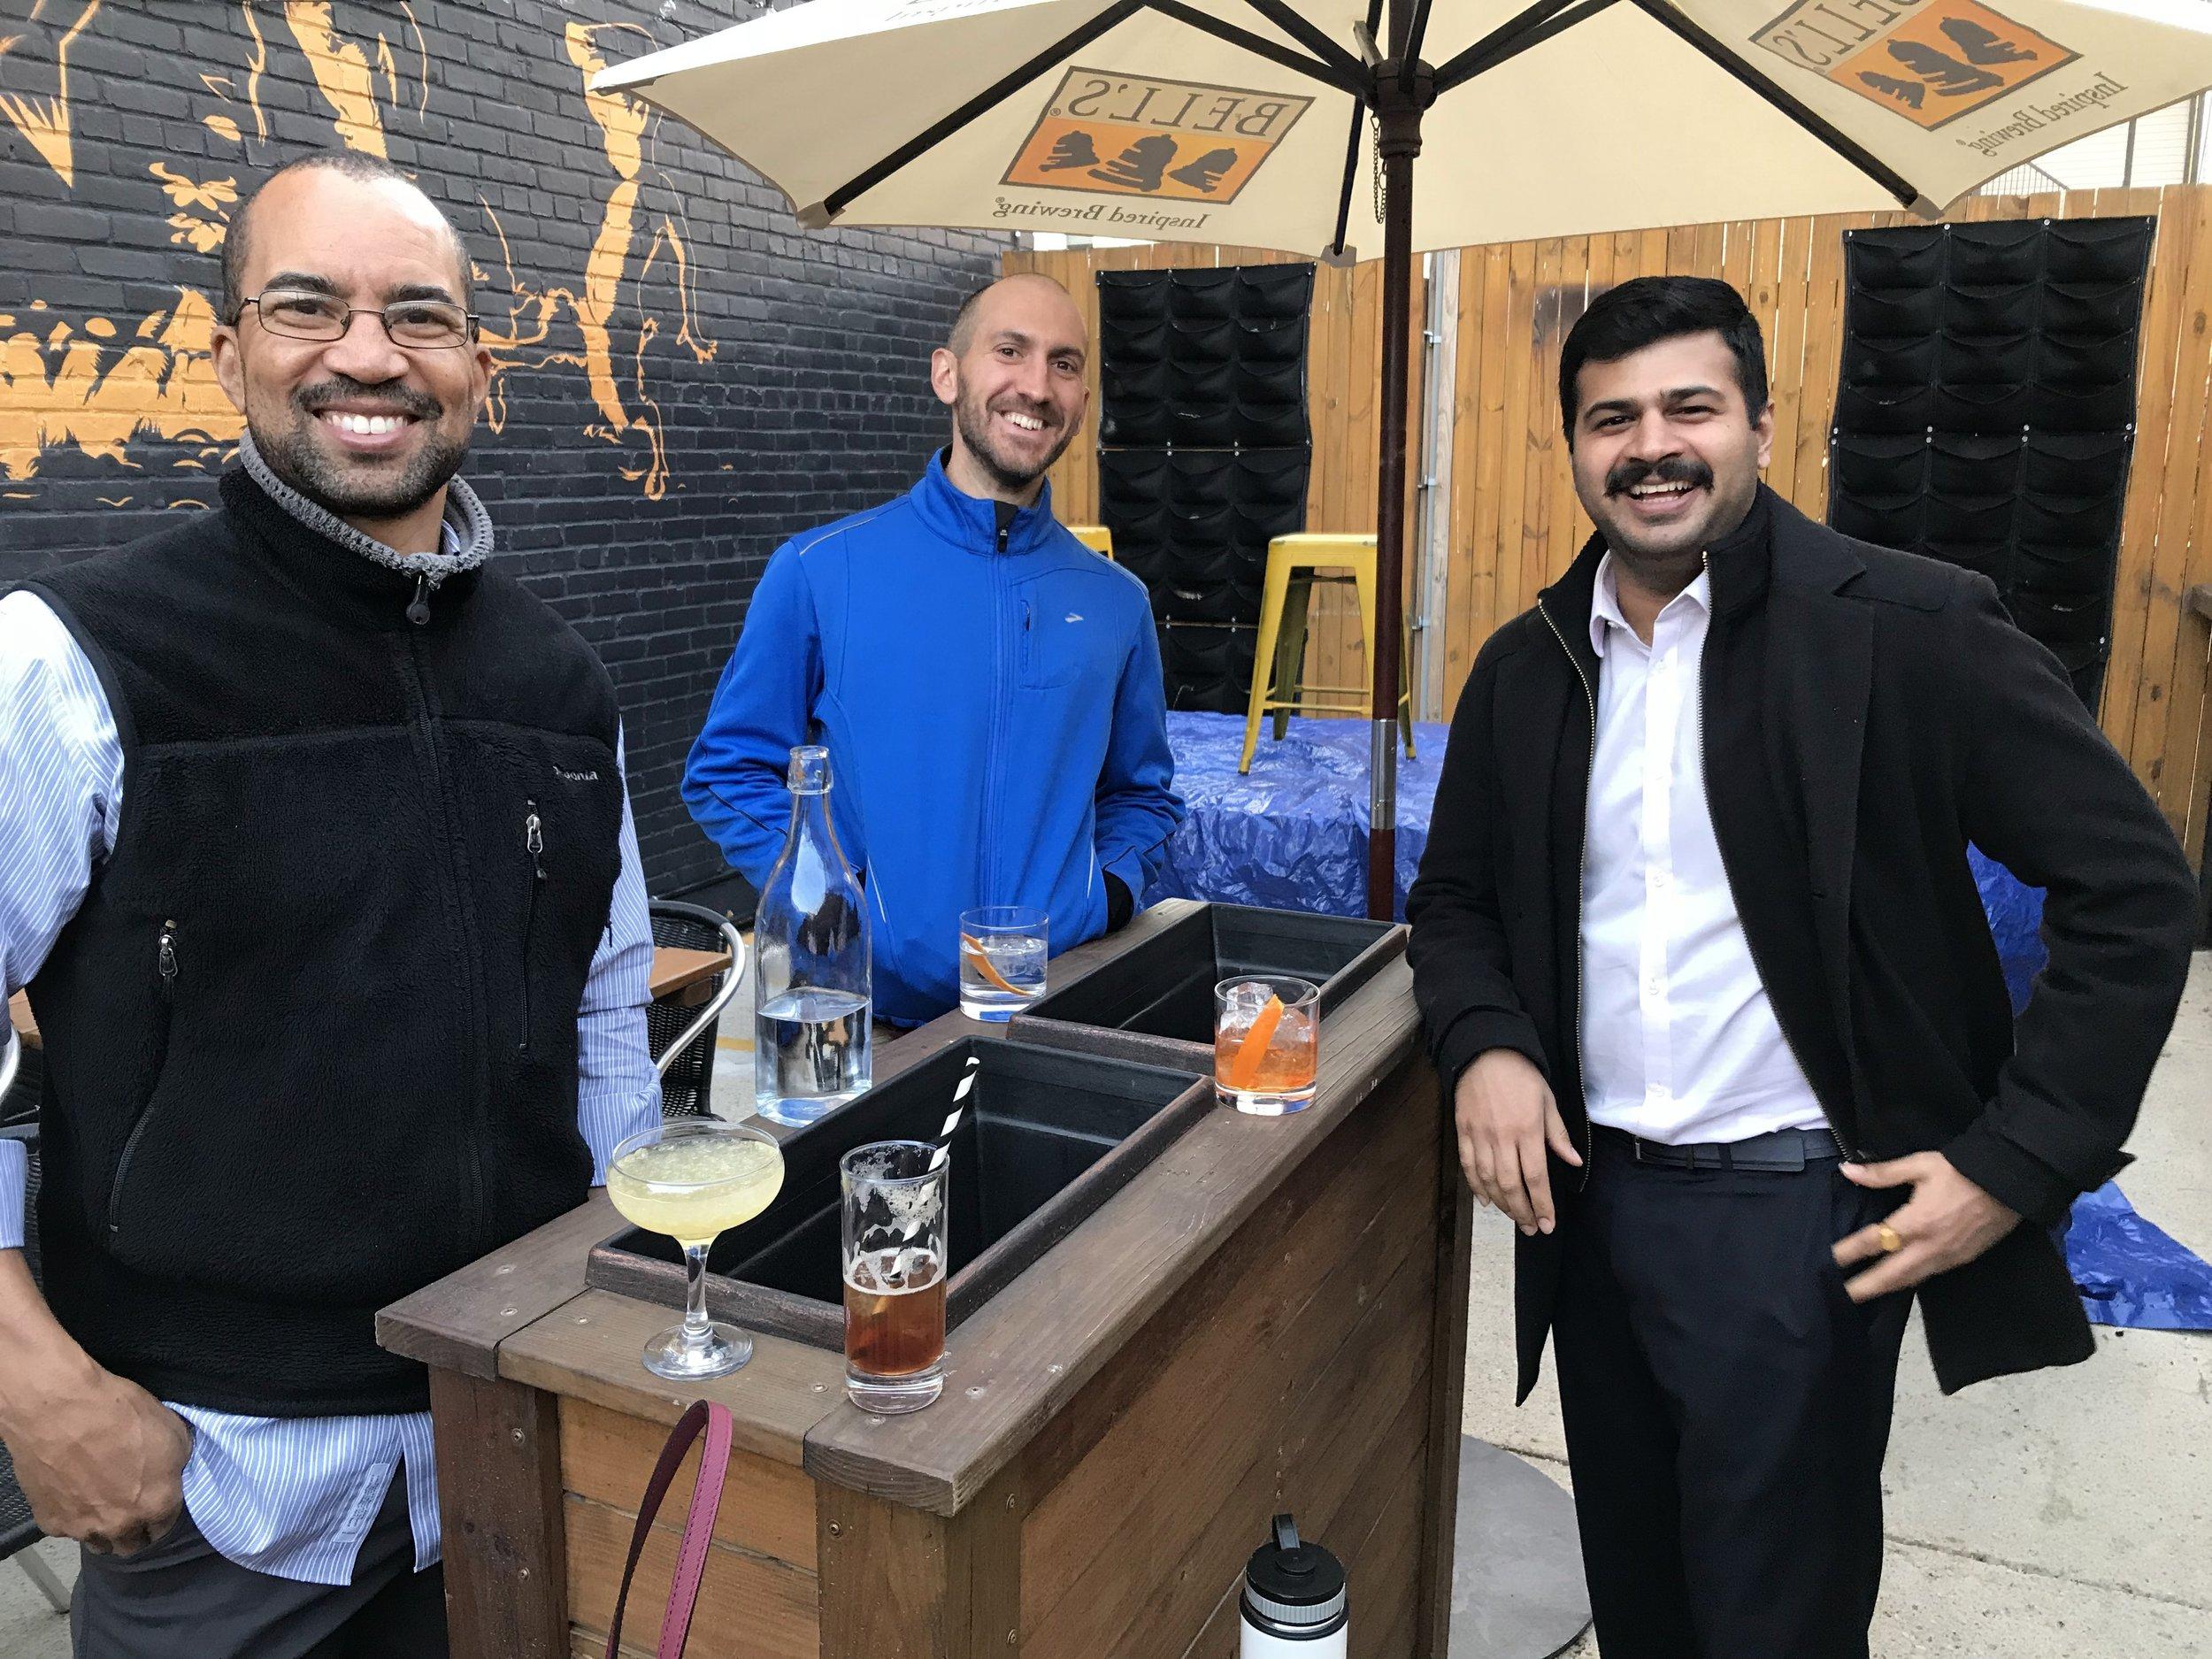 TrashHumans happy hour at Hank's Cocktail Bar